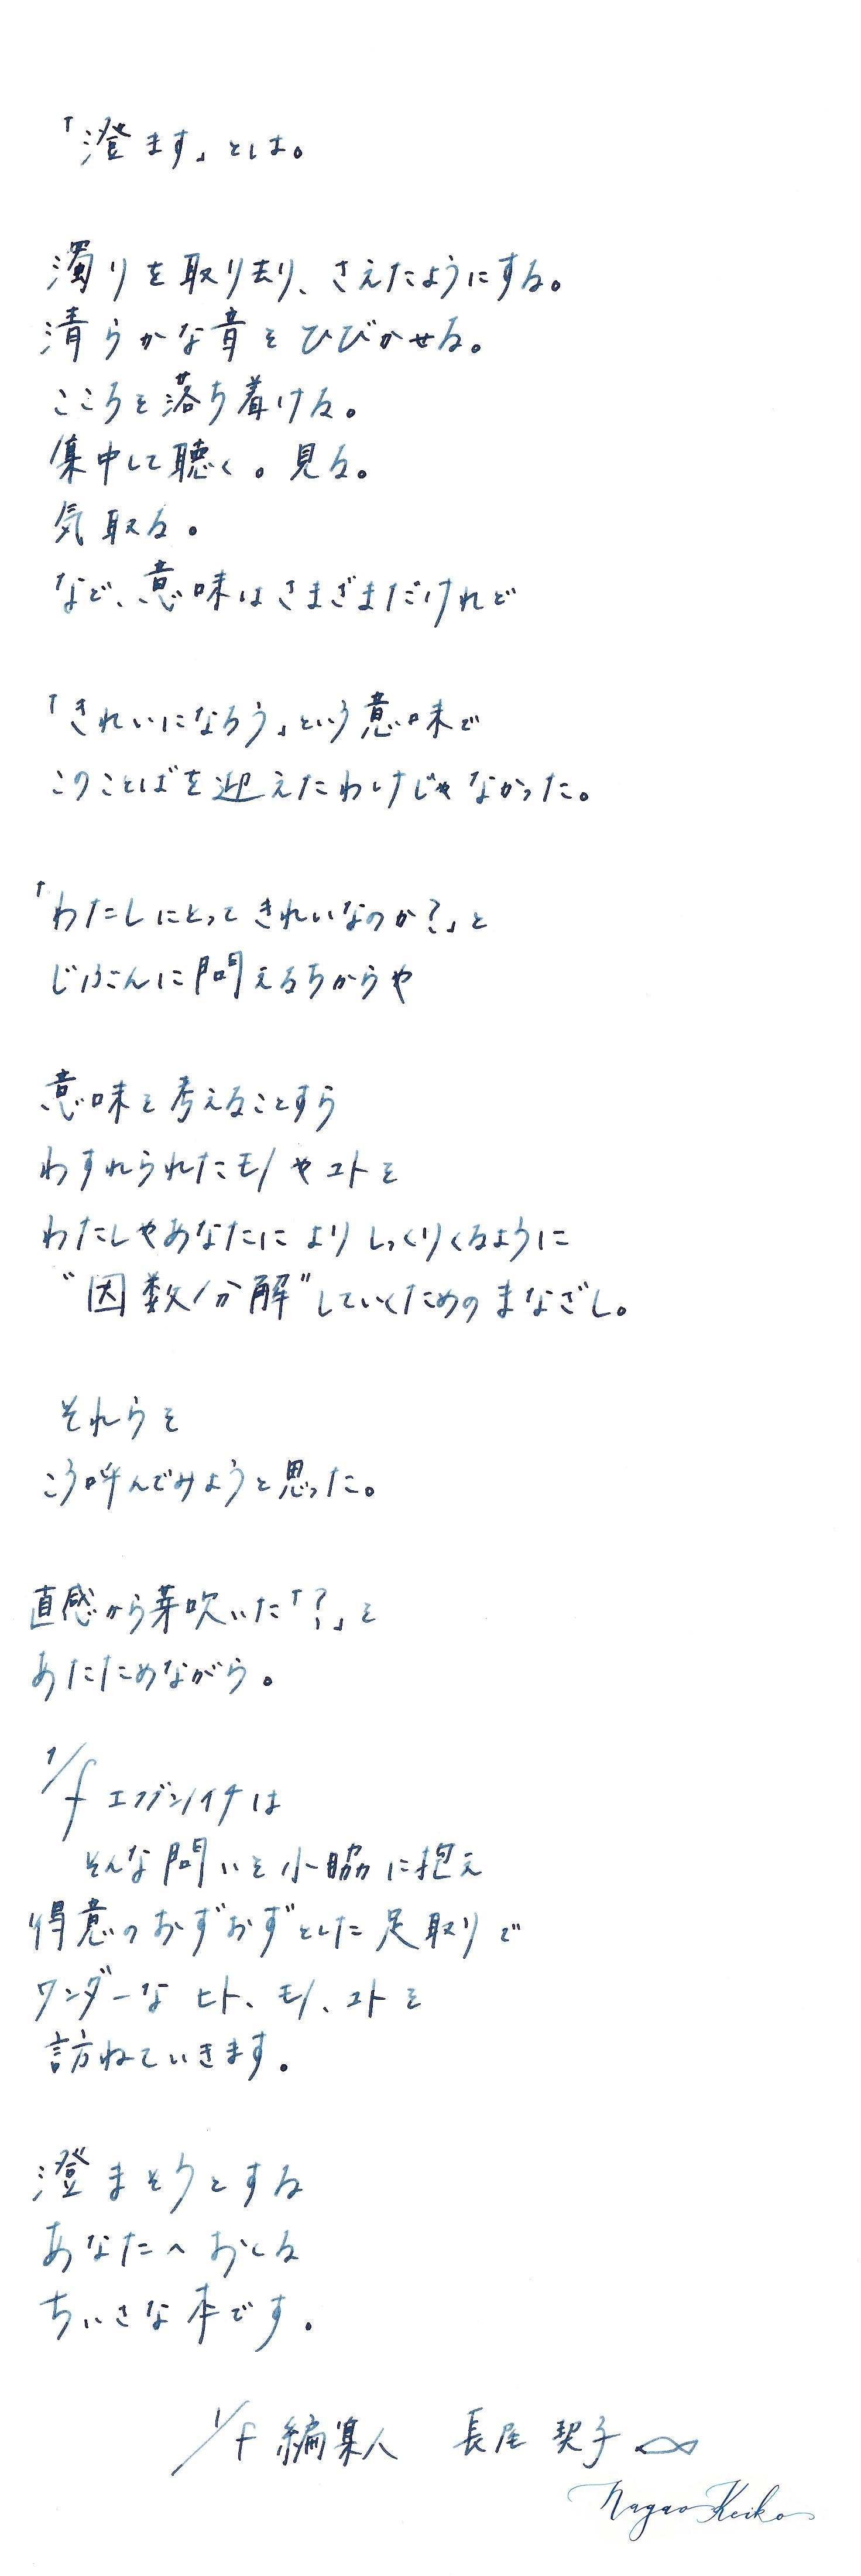 IMG_0002b.jpg